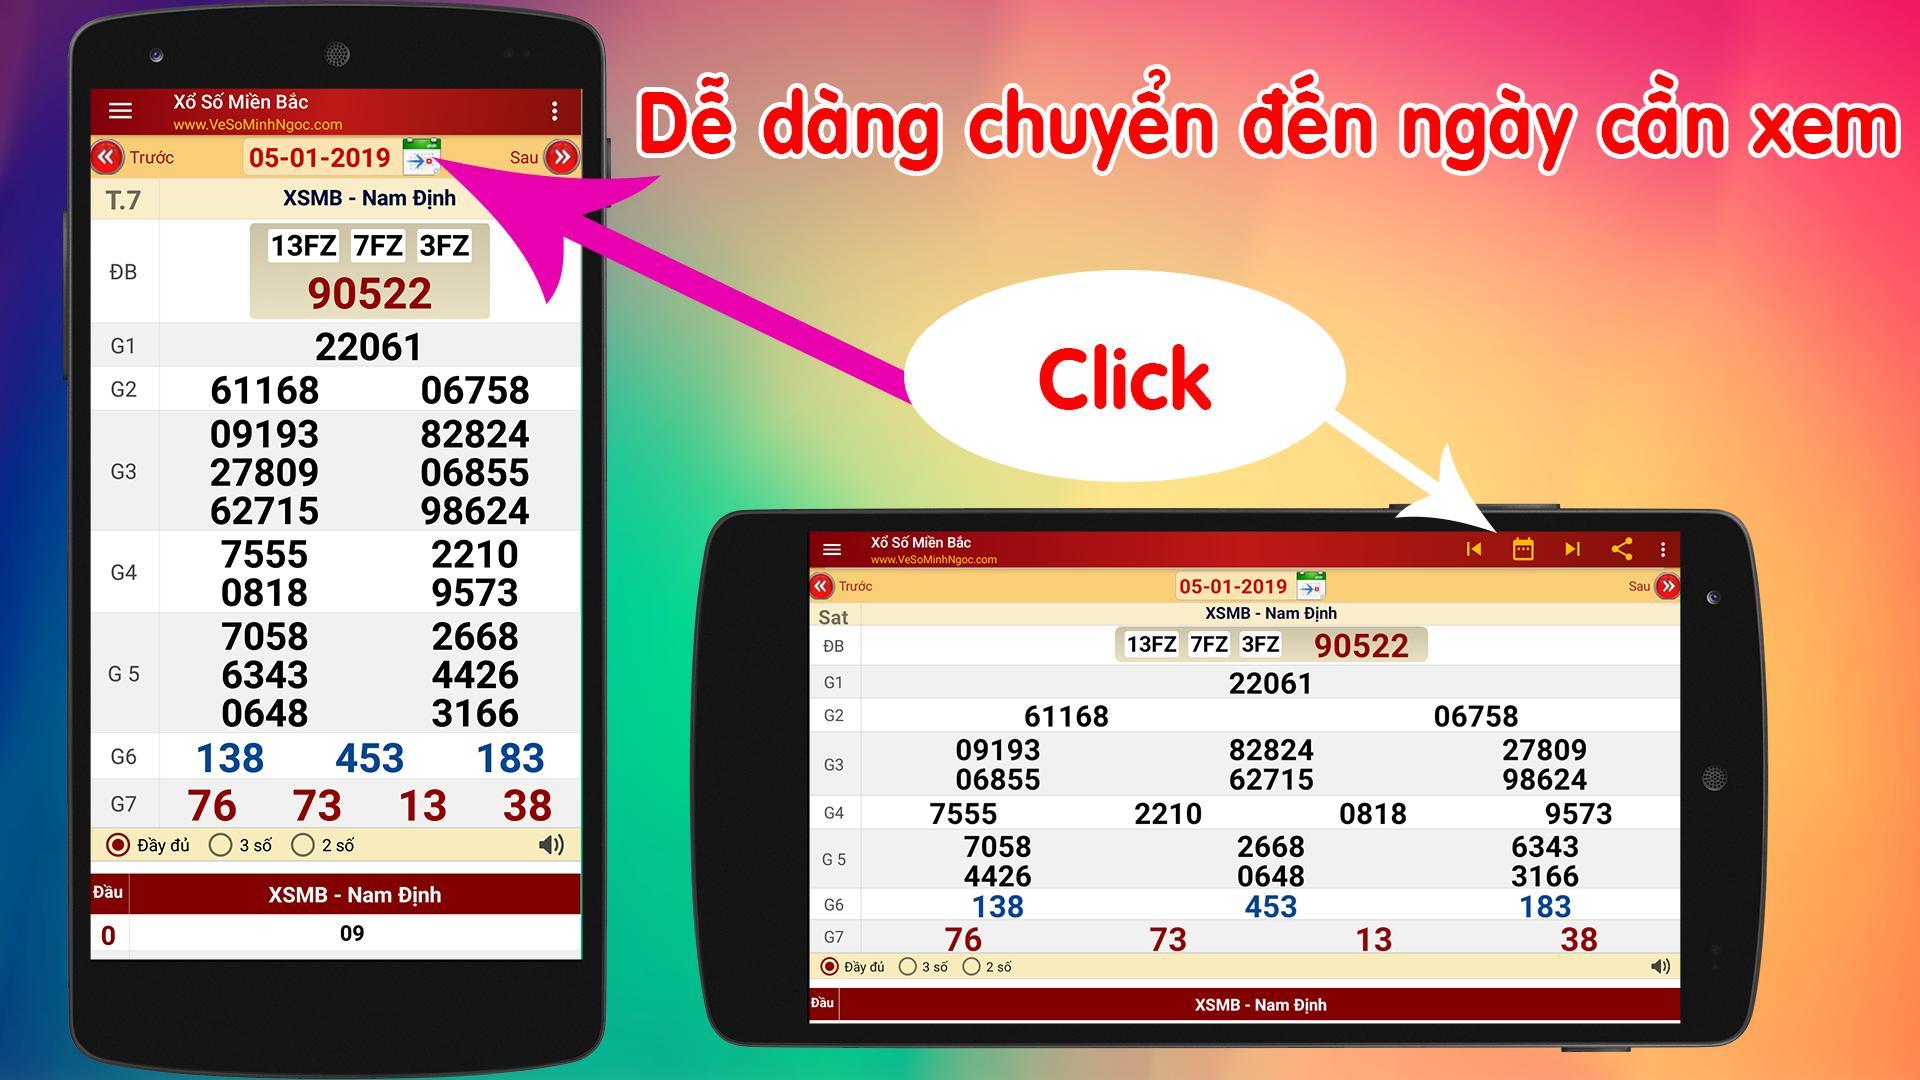 Kqxs Xsmn Xsmb Vietlott Trực Tiếp Xổ Số Minh Ngọc For Android Apk Download